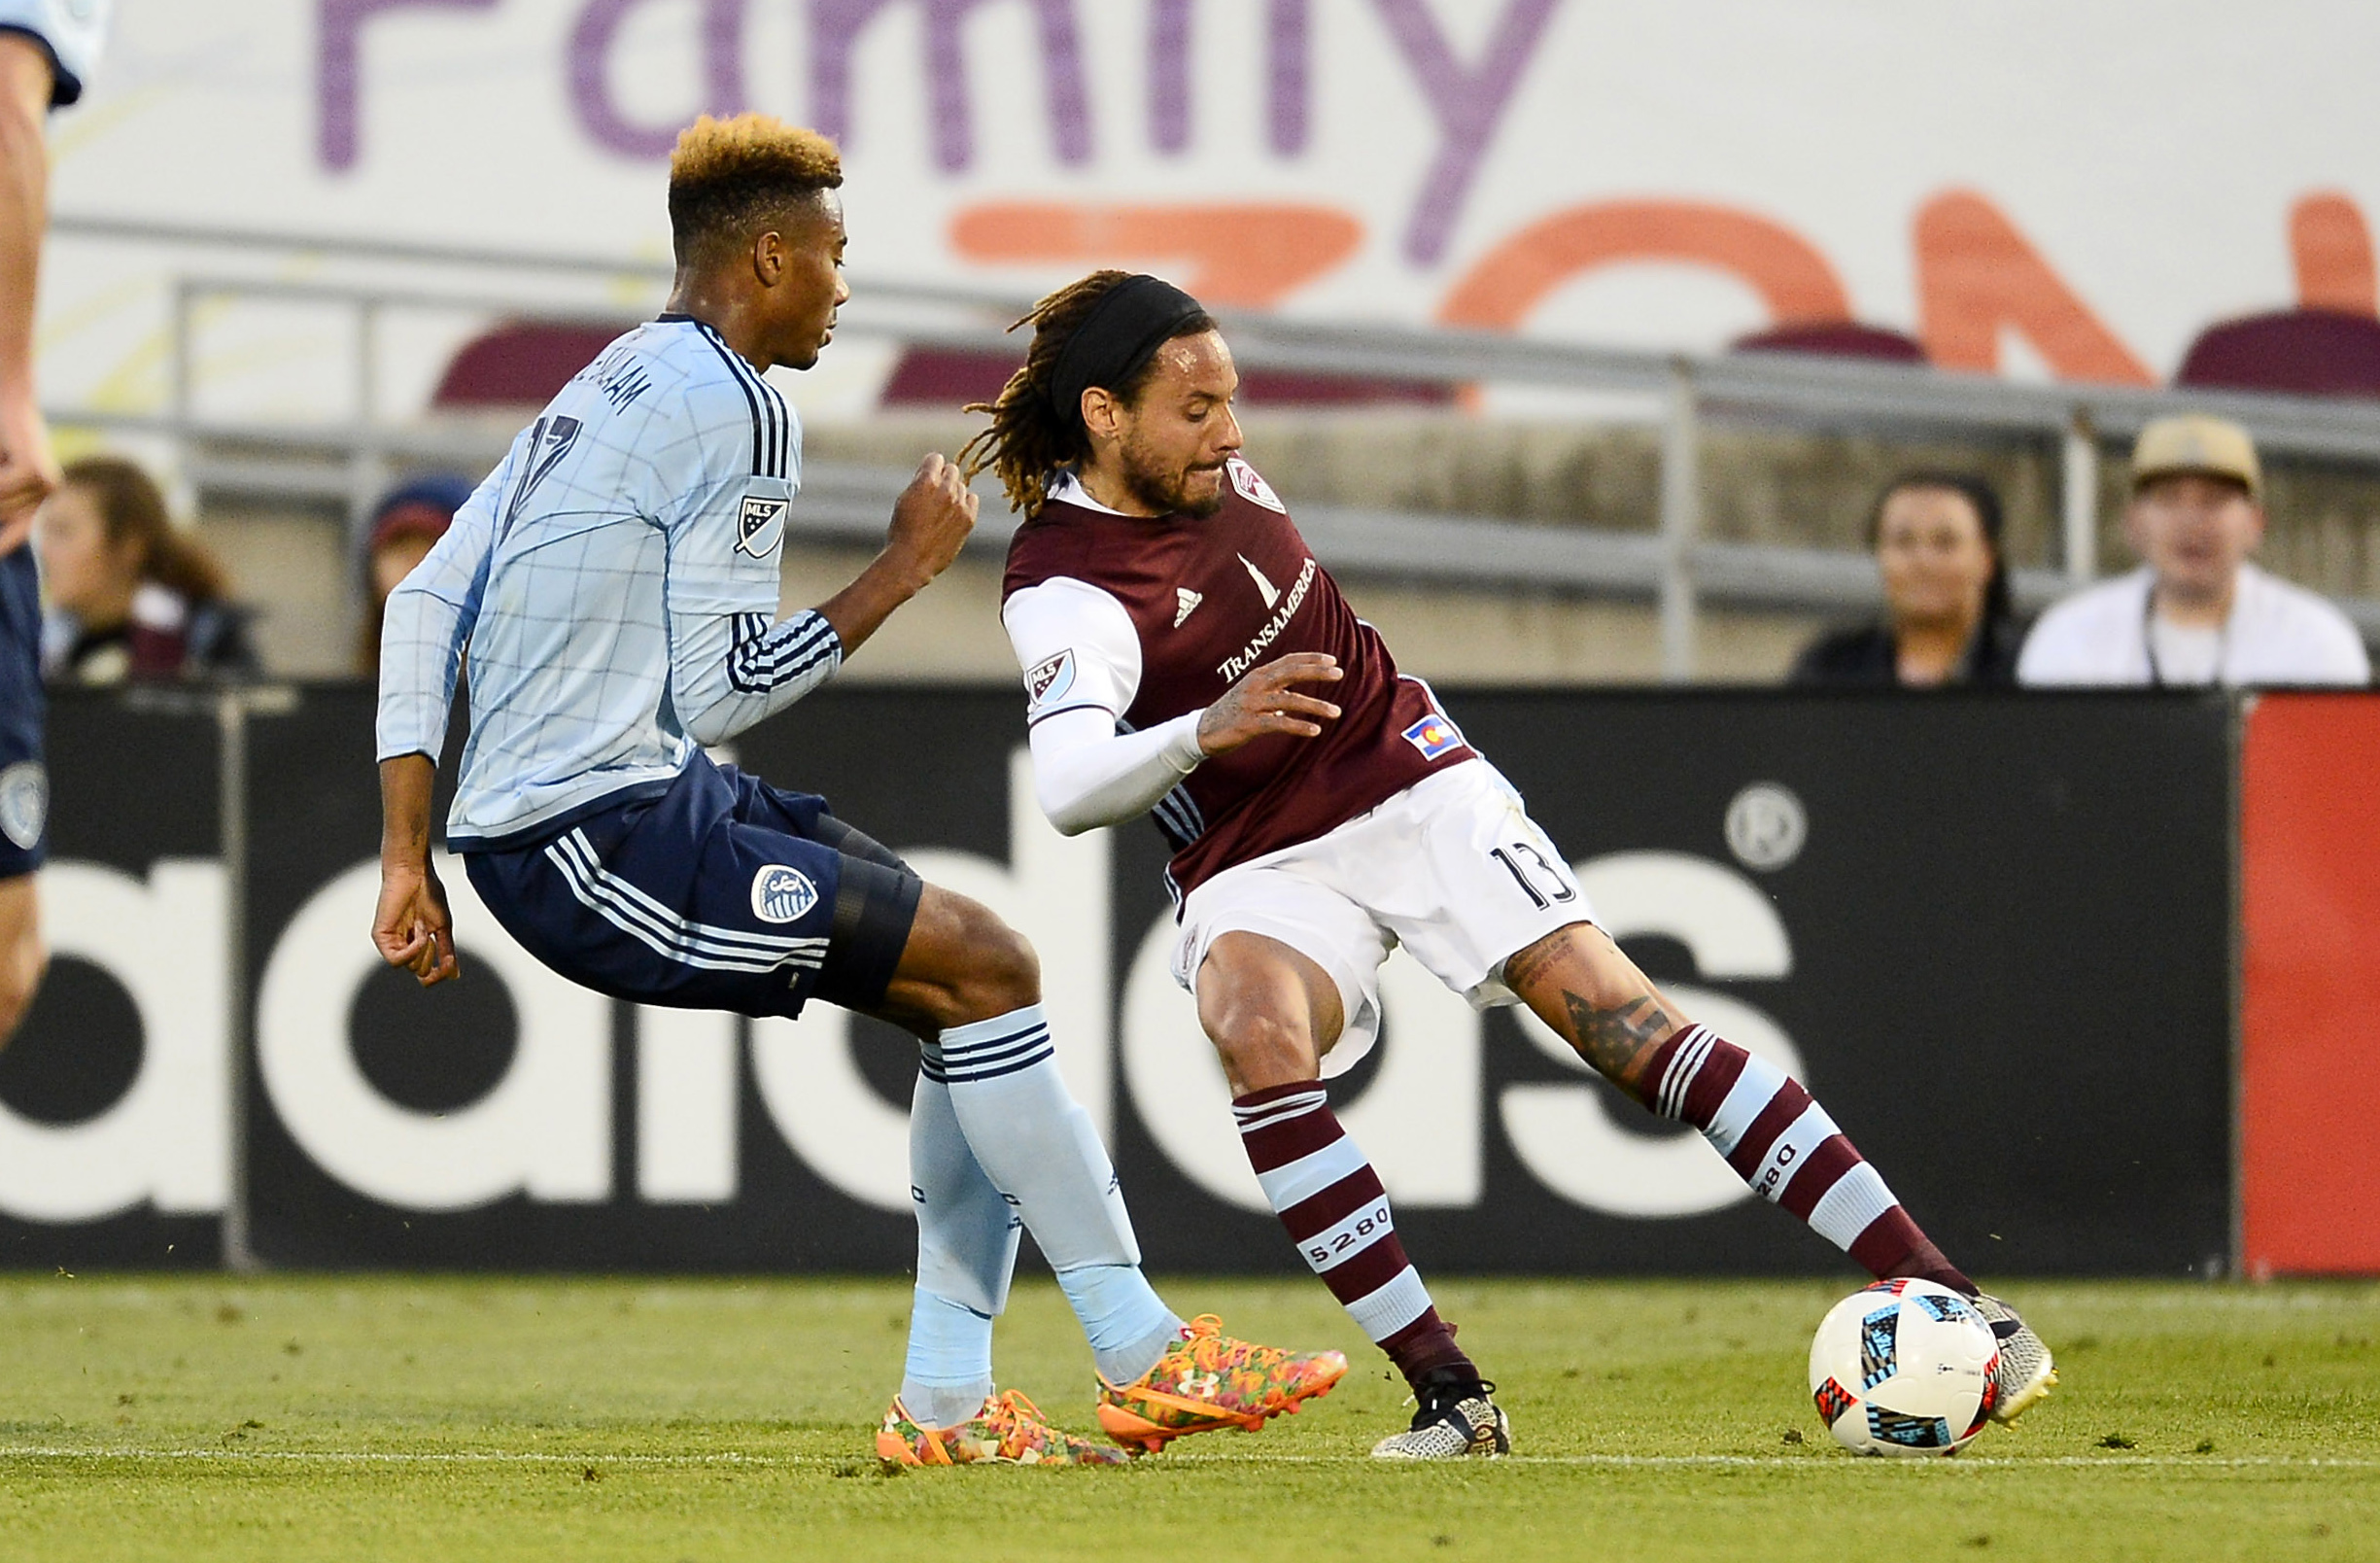 Rapids Jermaine Jones tries to get the ball past Saad Abdul-Salaam